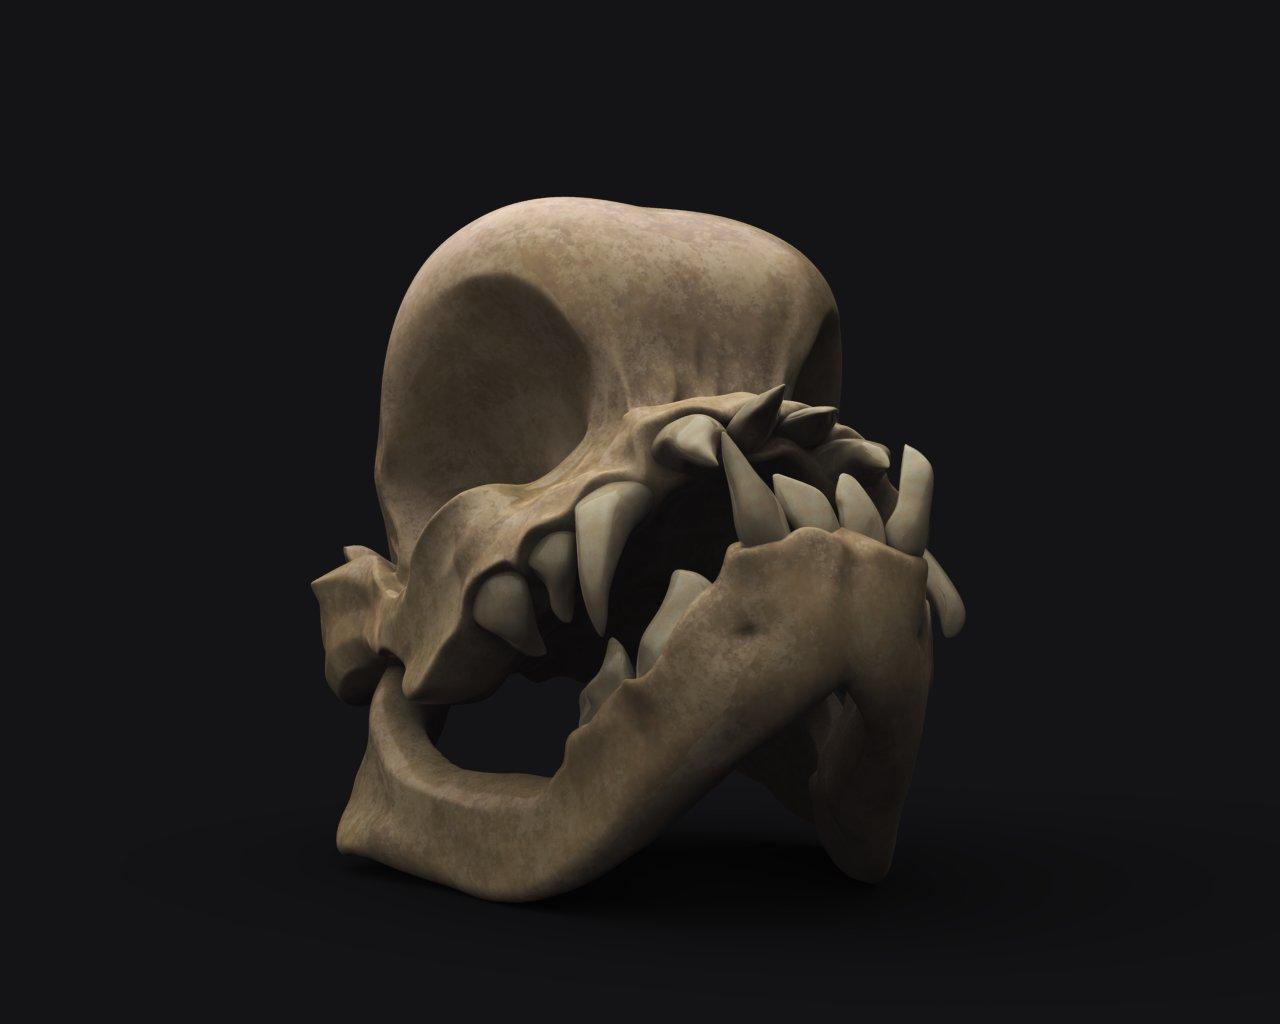 ArtStation - Pug Skull, Ida Hove-Kreutzfeldt